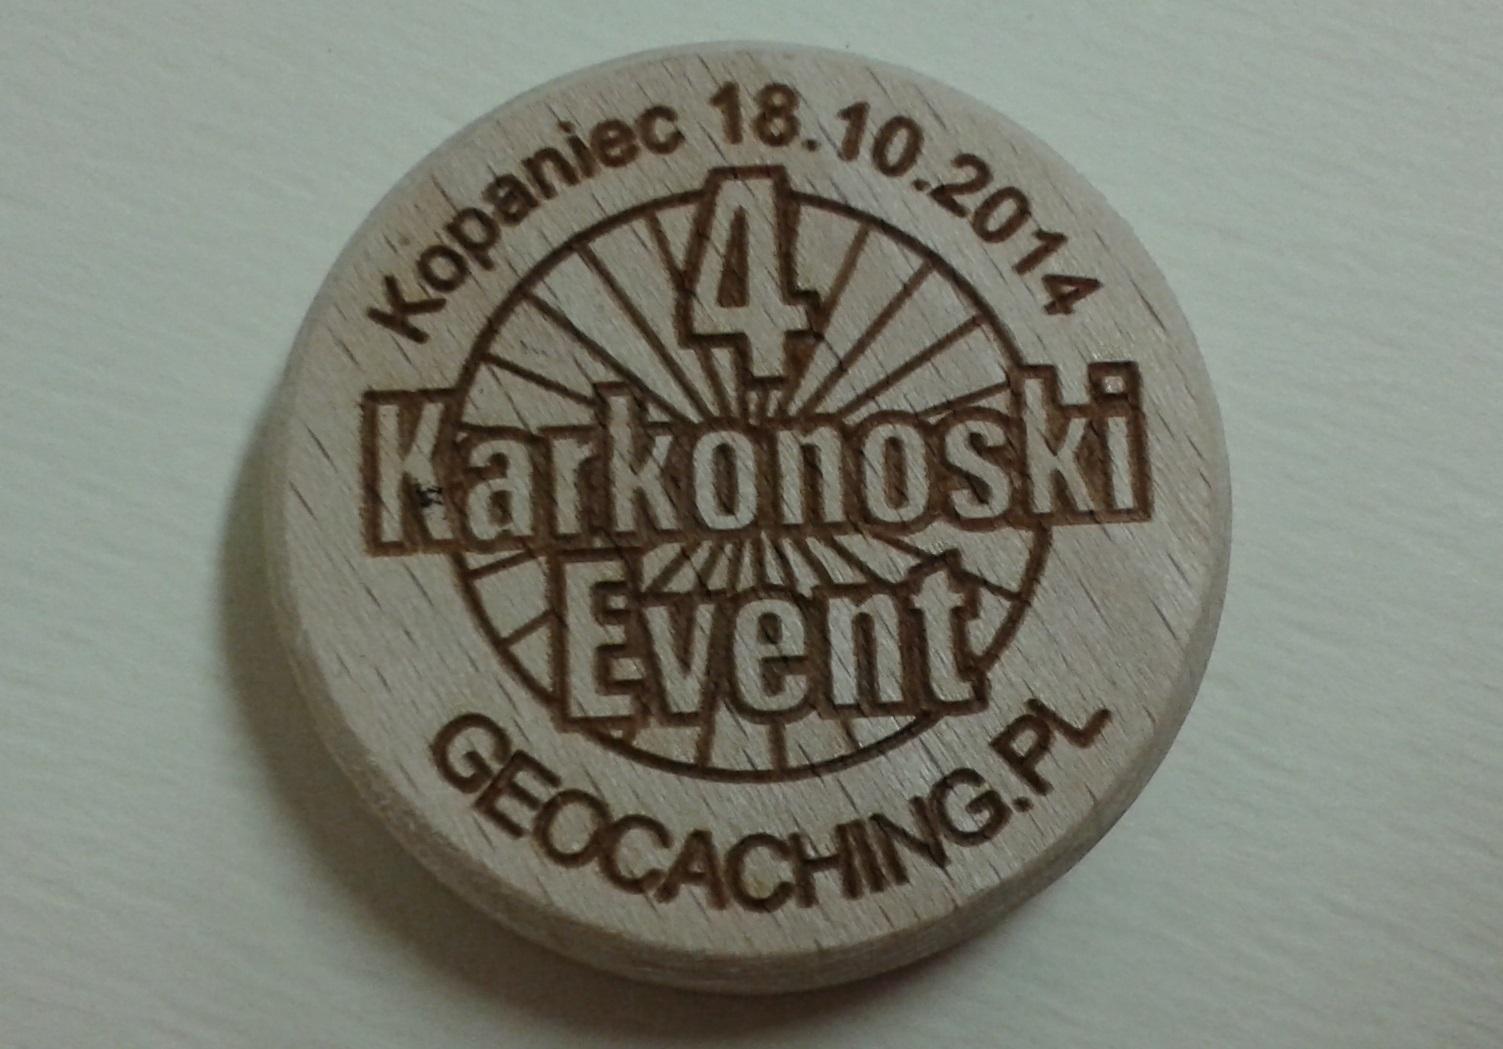 www.abditus.eu_PWG_4_Karkonoski_Event.jpg